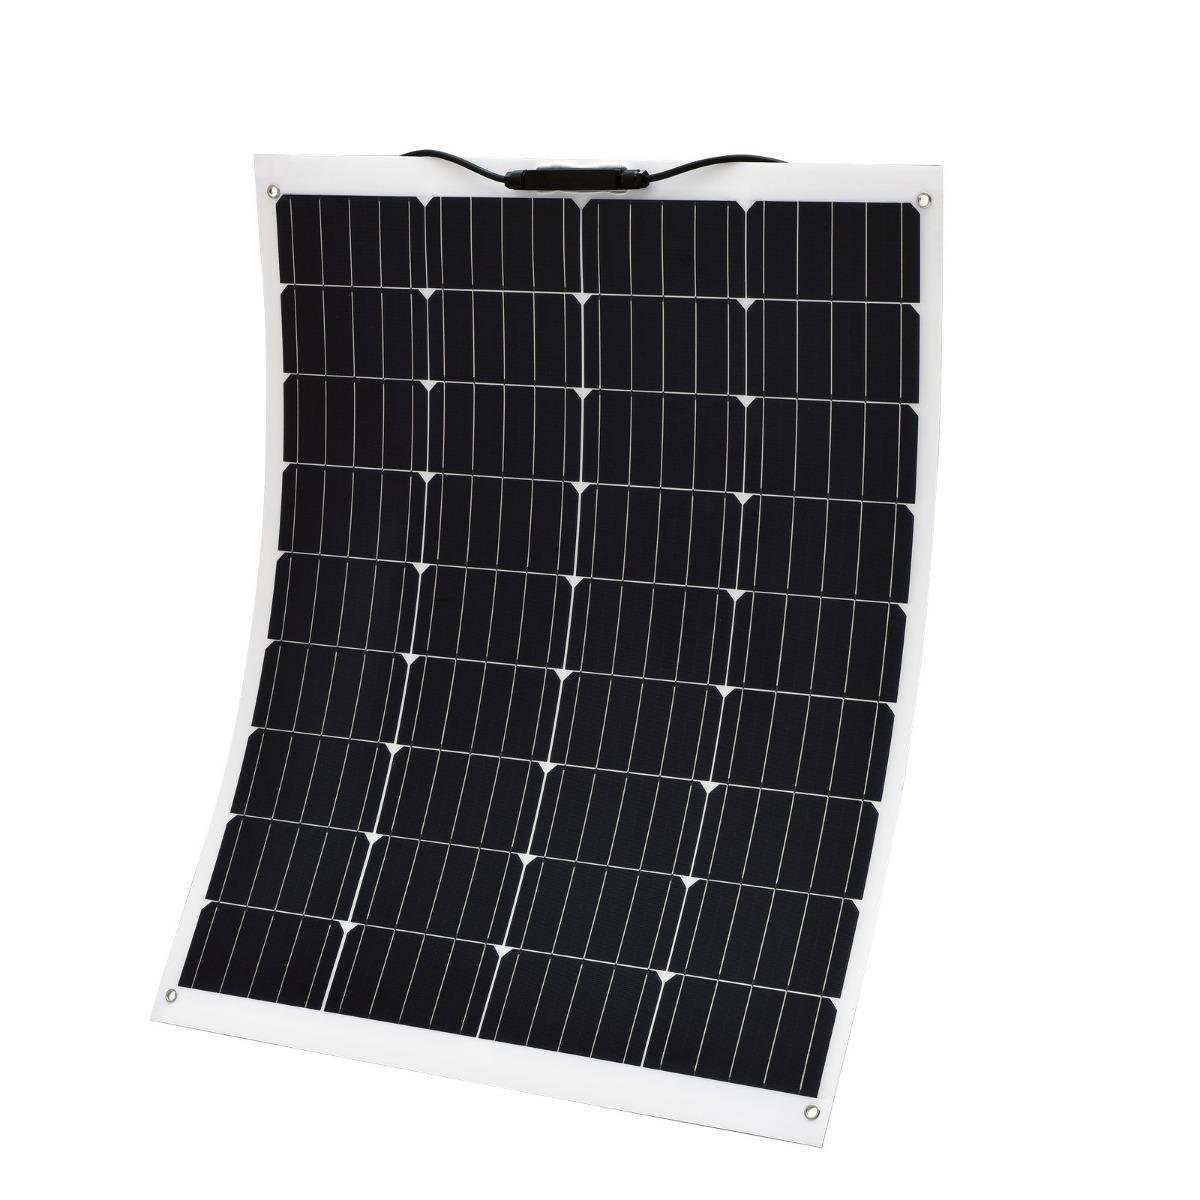 140W 12V Flexible Solar Panel Boat Caravan Camping Power Mono Charging Kit